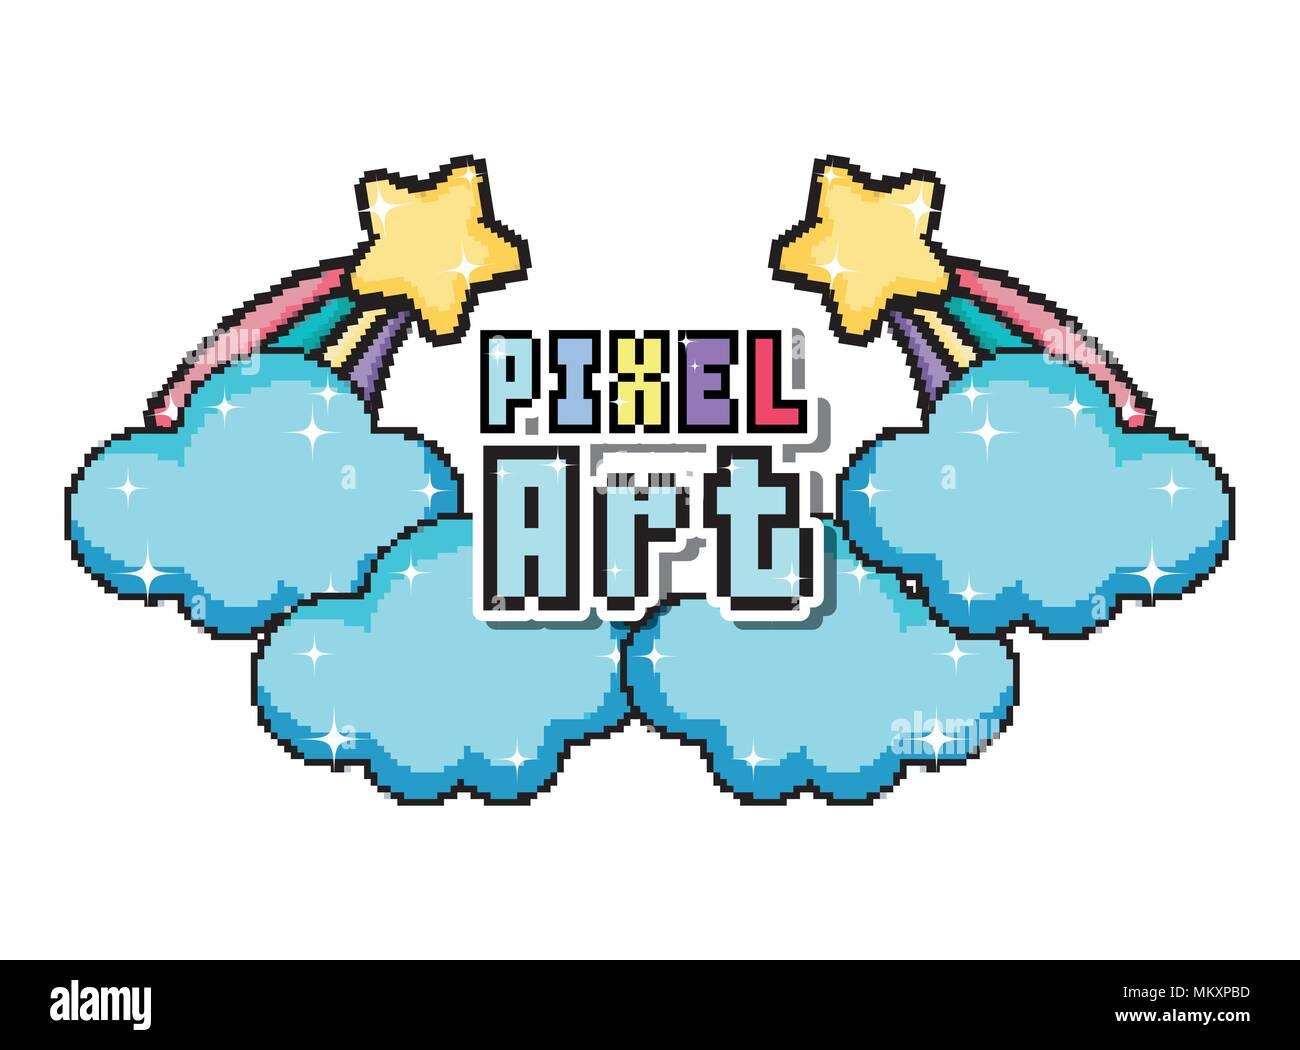 Pixel Art Cartoon Stock Vector Art Illustration Vector